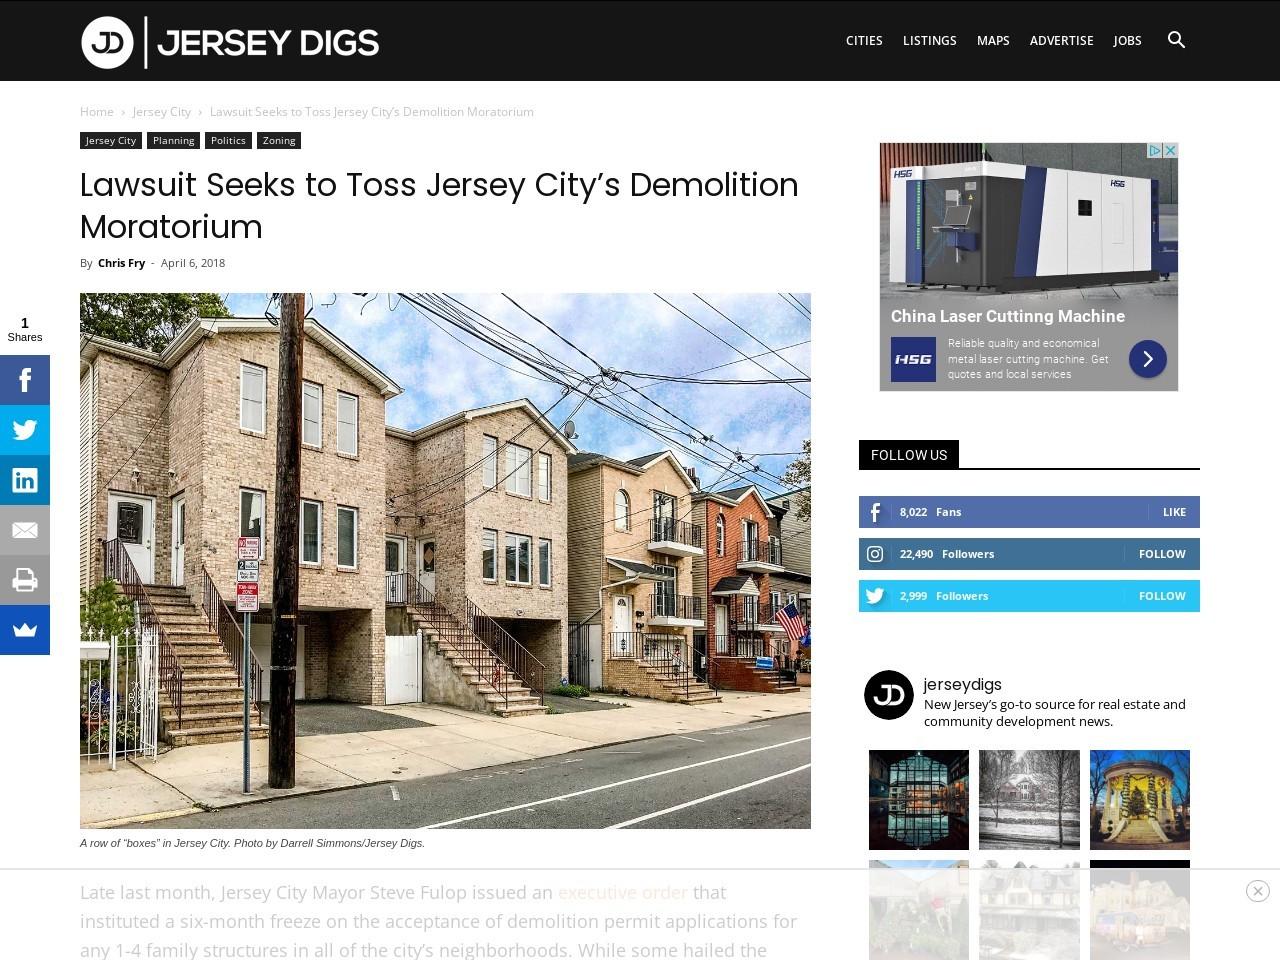 Lawsuit Seeks to Toss Jersey City's Demolition Moratorium